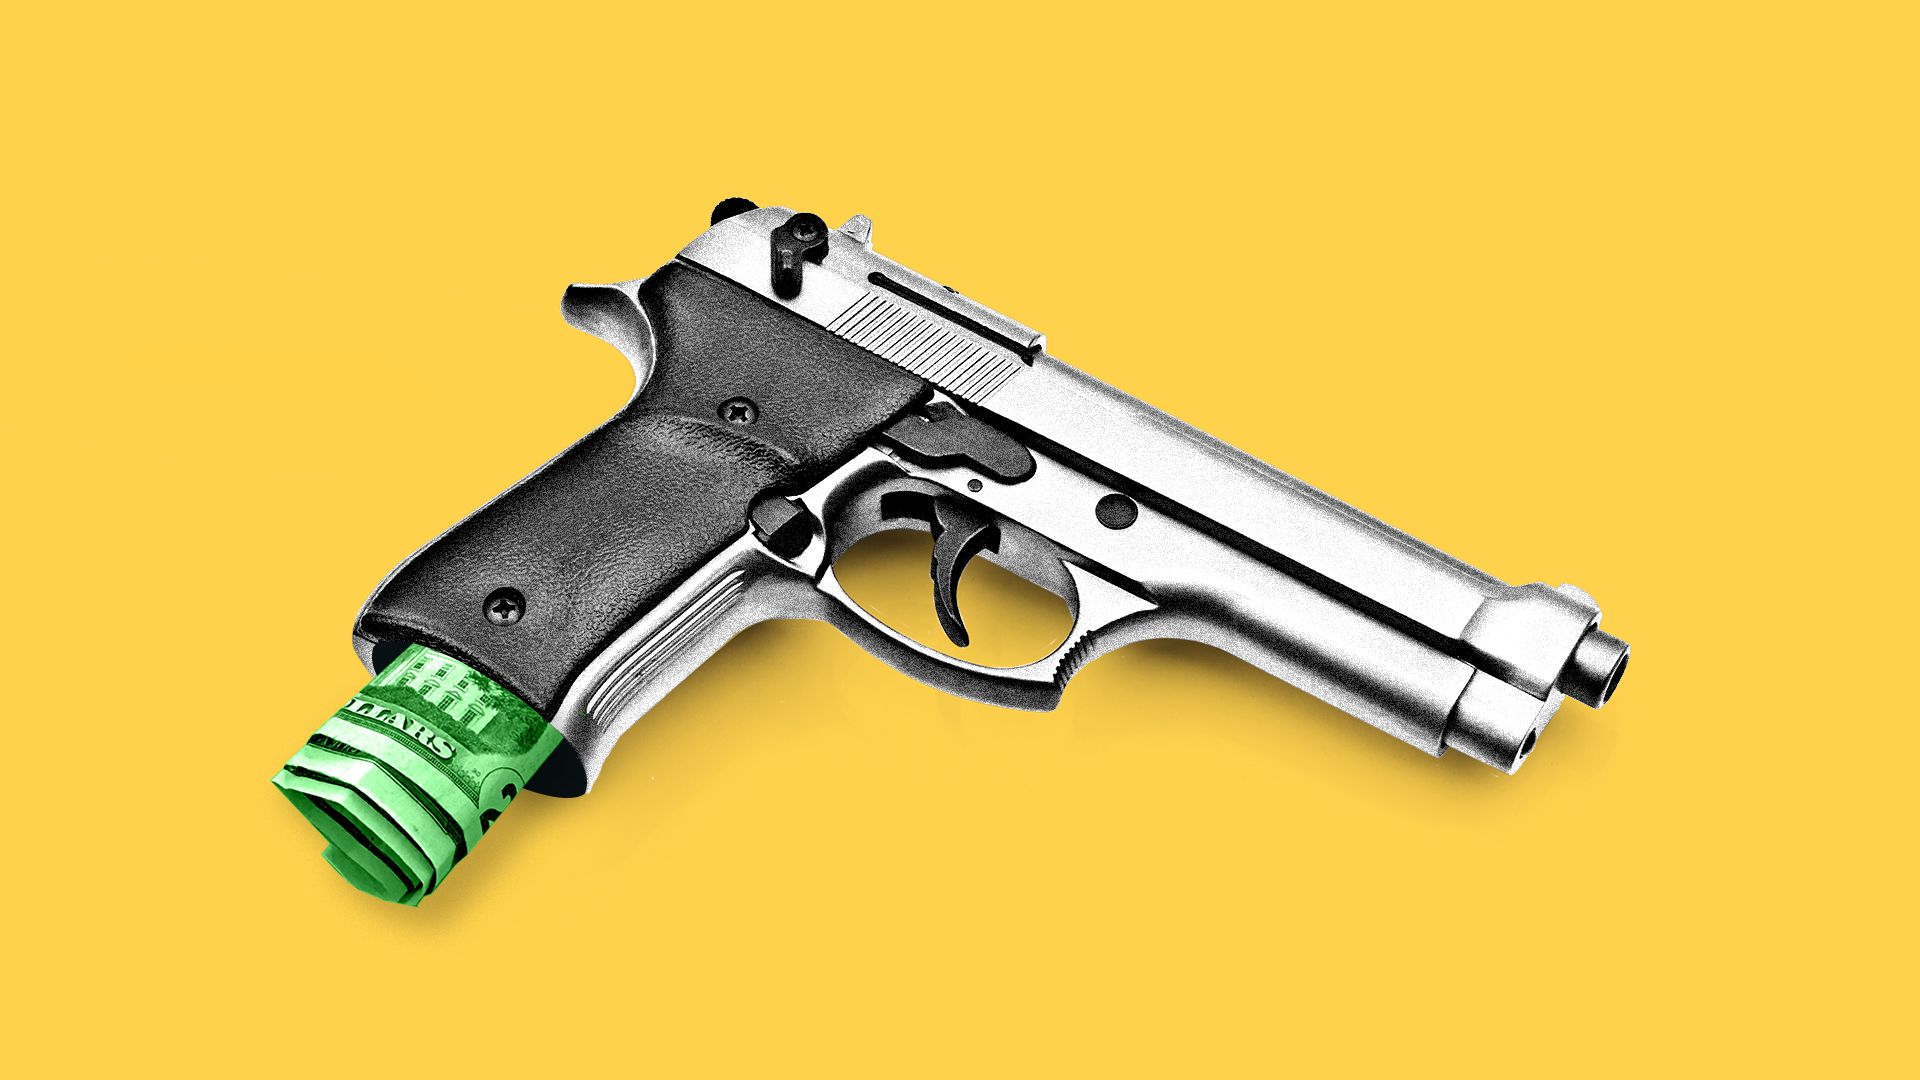 illustration of gun